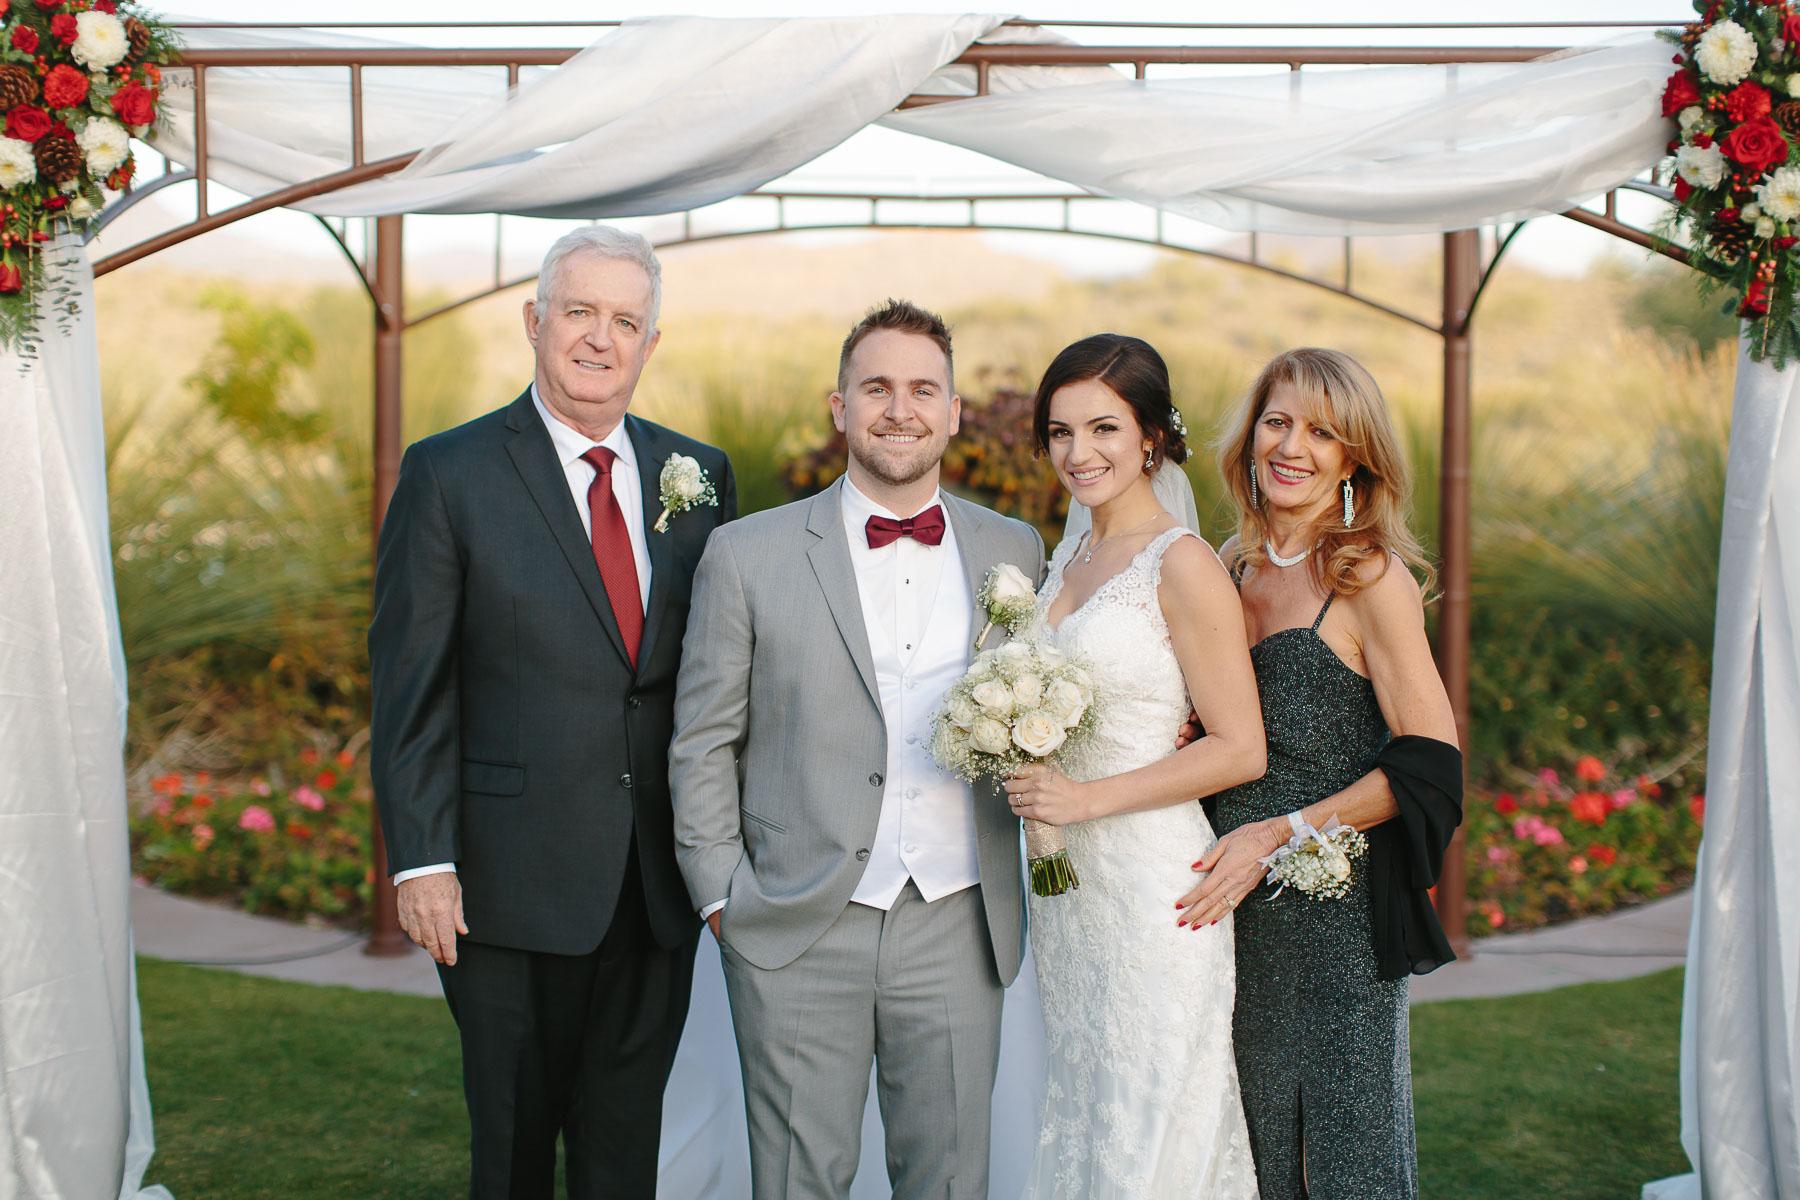 161210-Luxium-Weddings-Arizona-Matt-Jenny-Anthem-Golf-Country-Club-1042.jpg